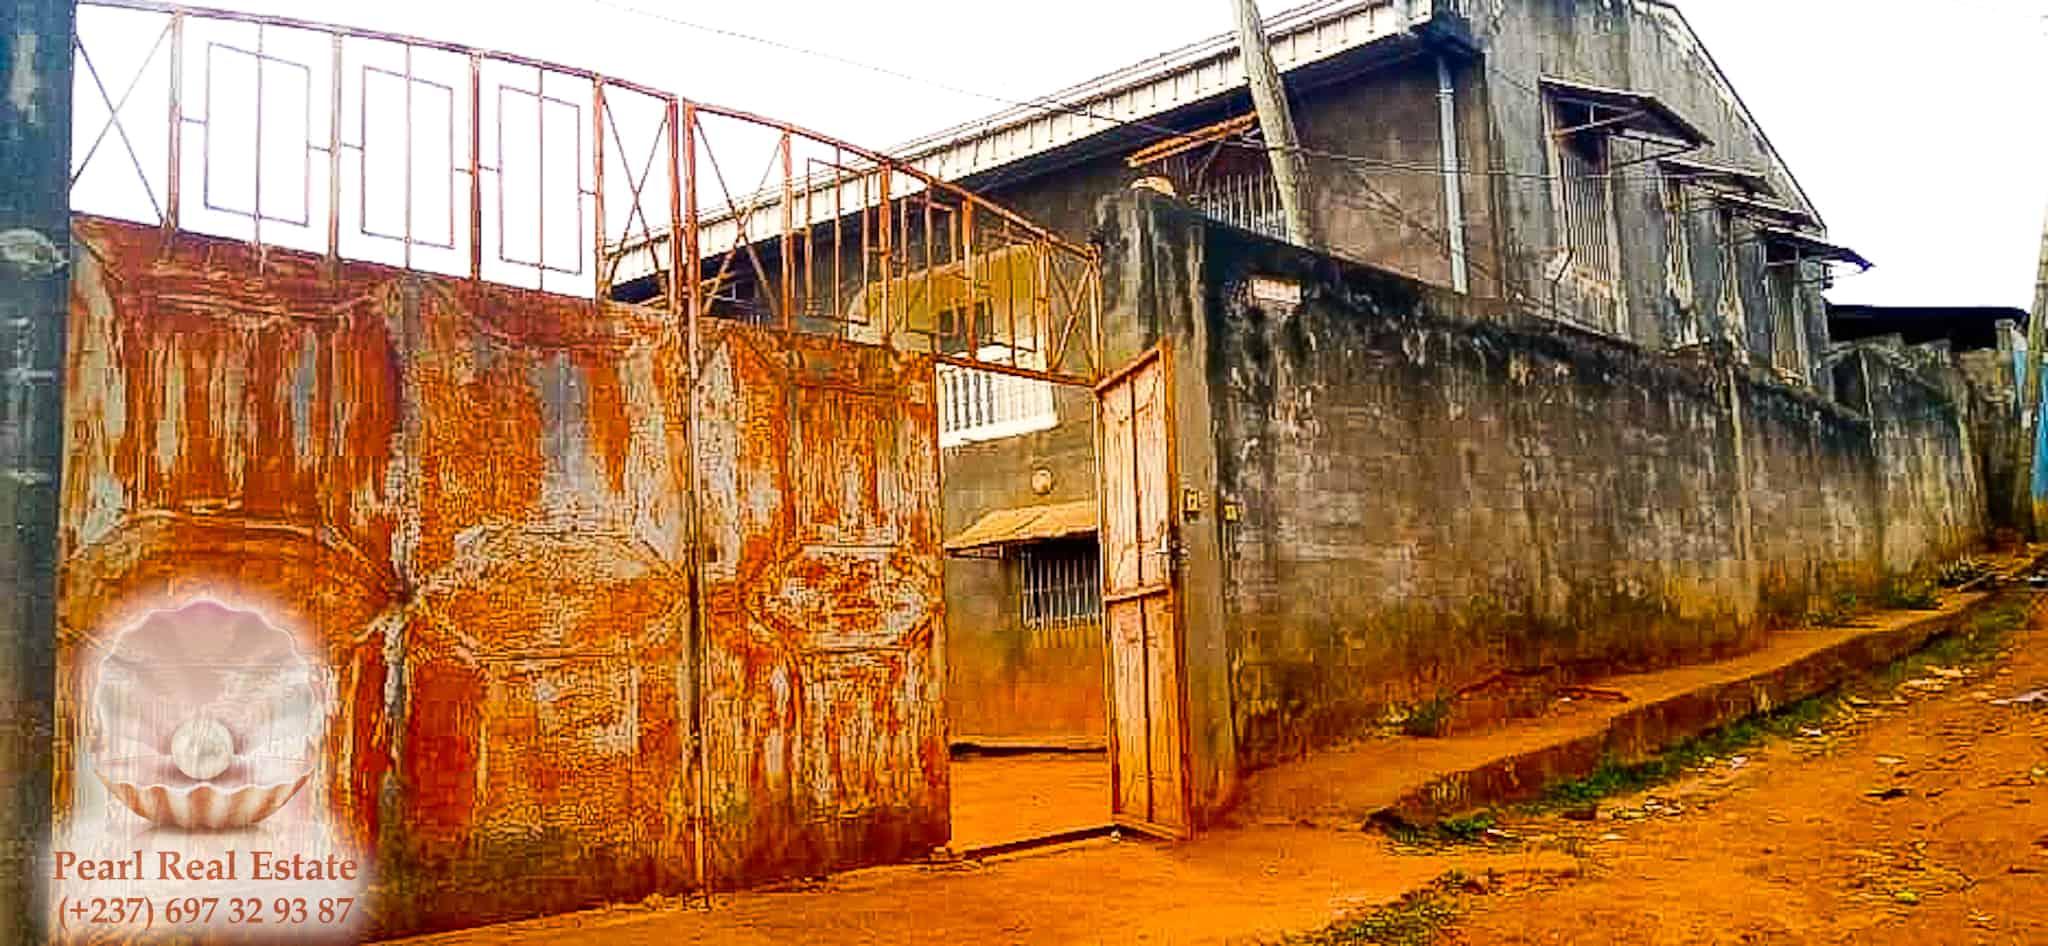 House (Villa) for sale - Yaoundé, Emana, Borne fontaine - 1 living room(s), 4 bedroom(s), 3 bathroom(s) - 40 000 000 FCFA / month